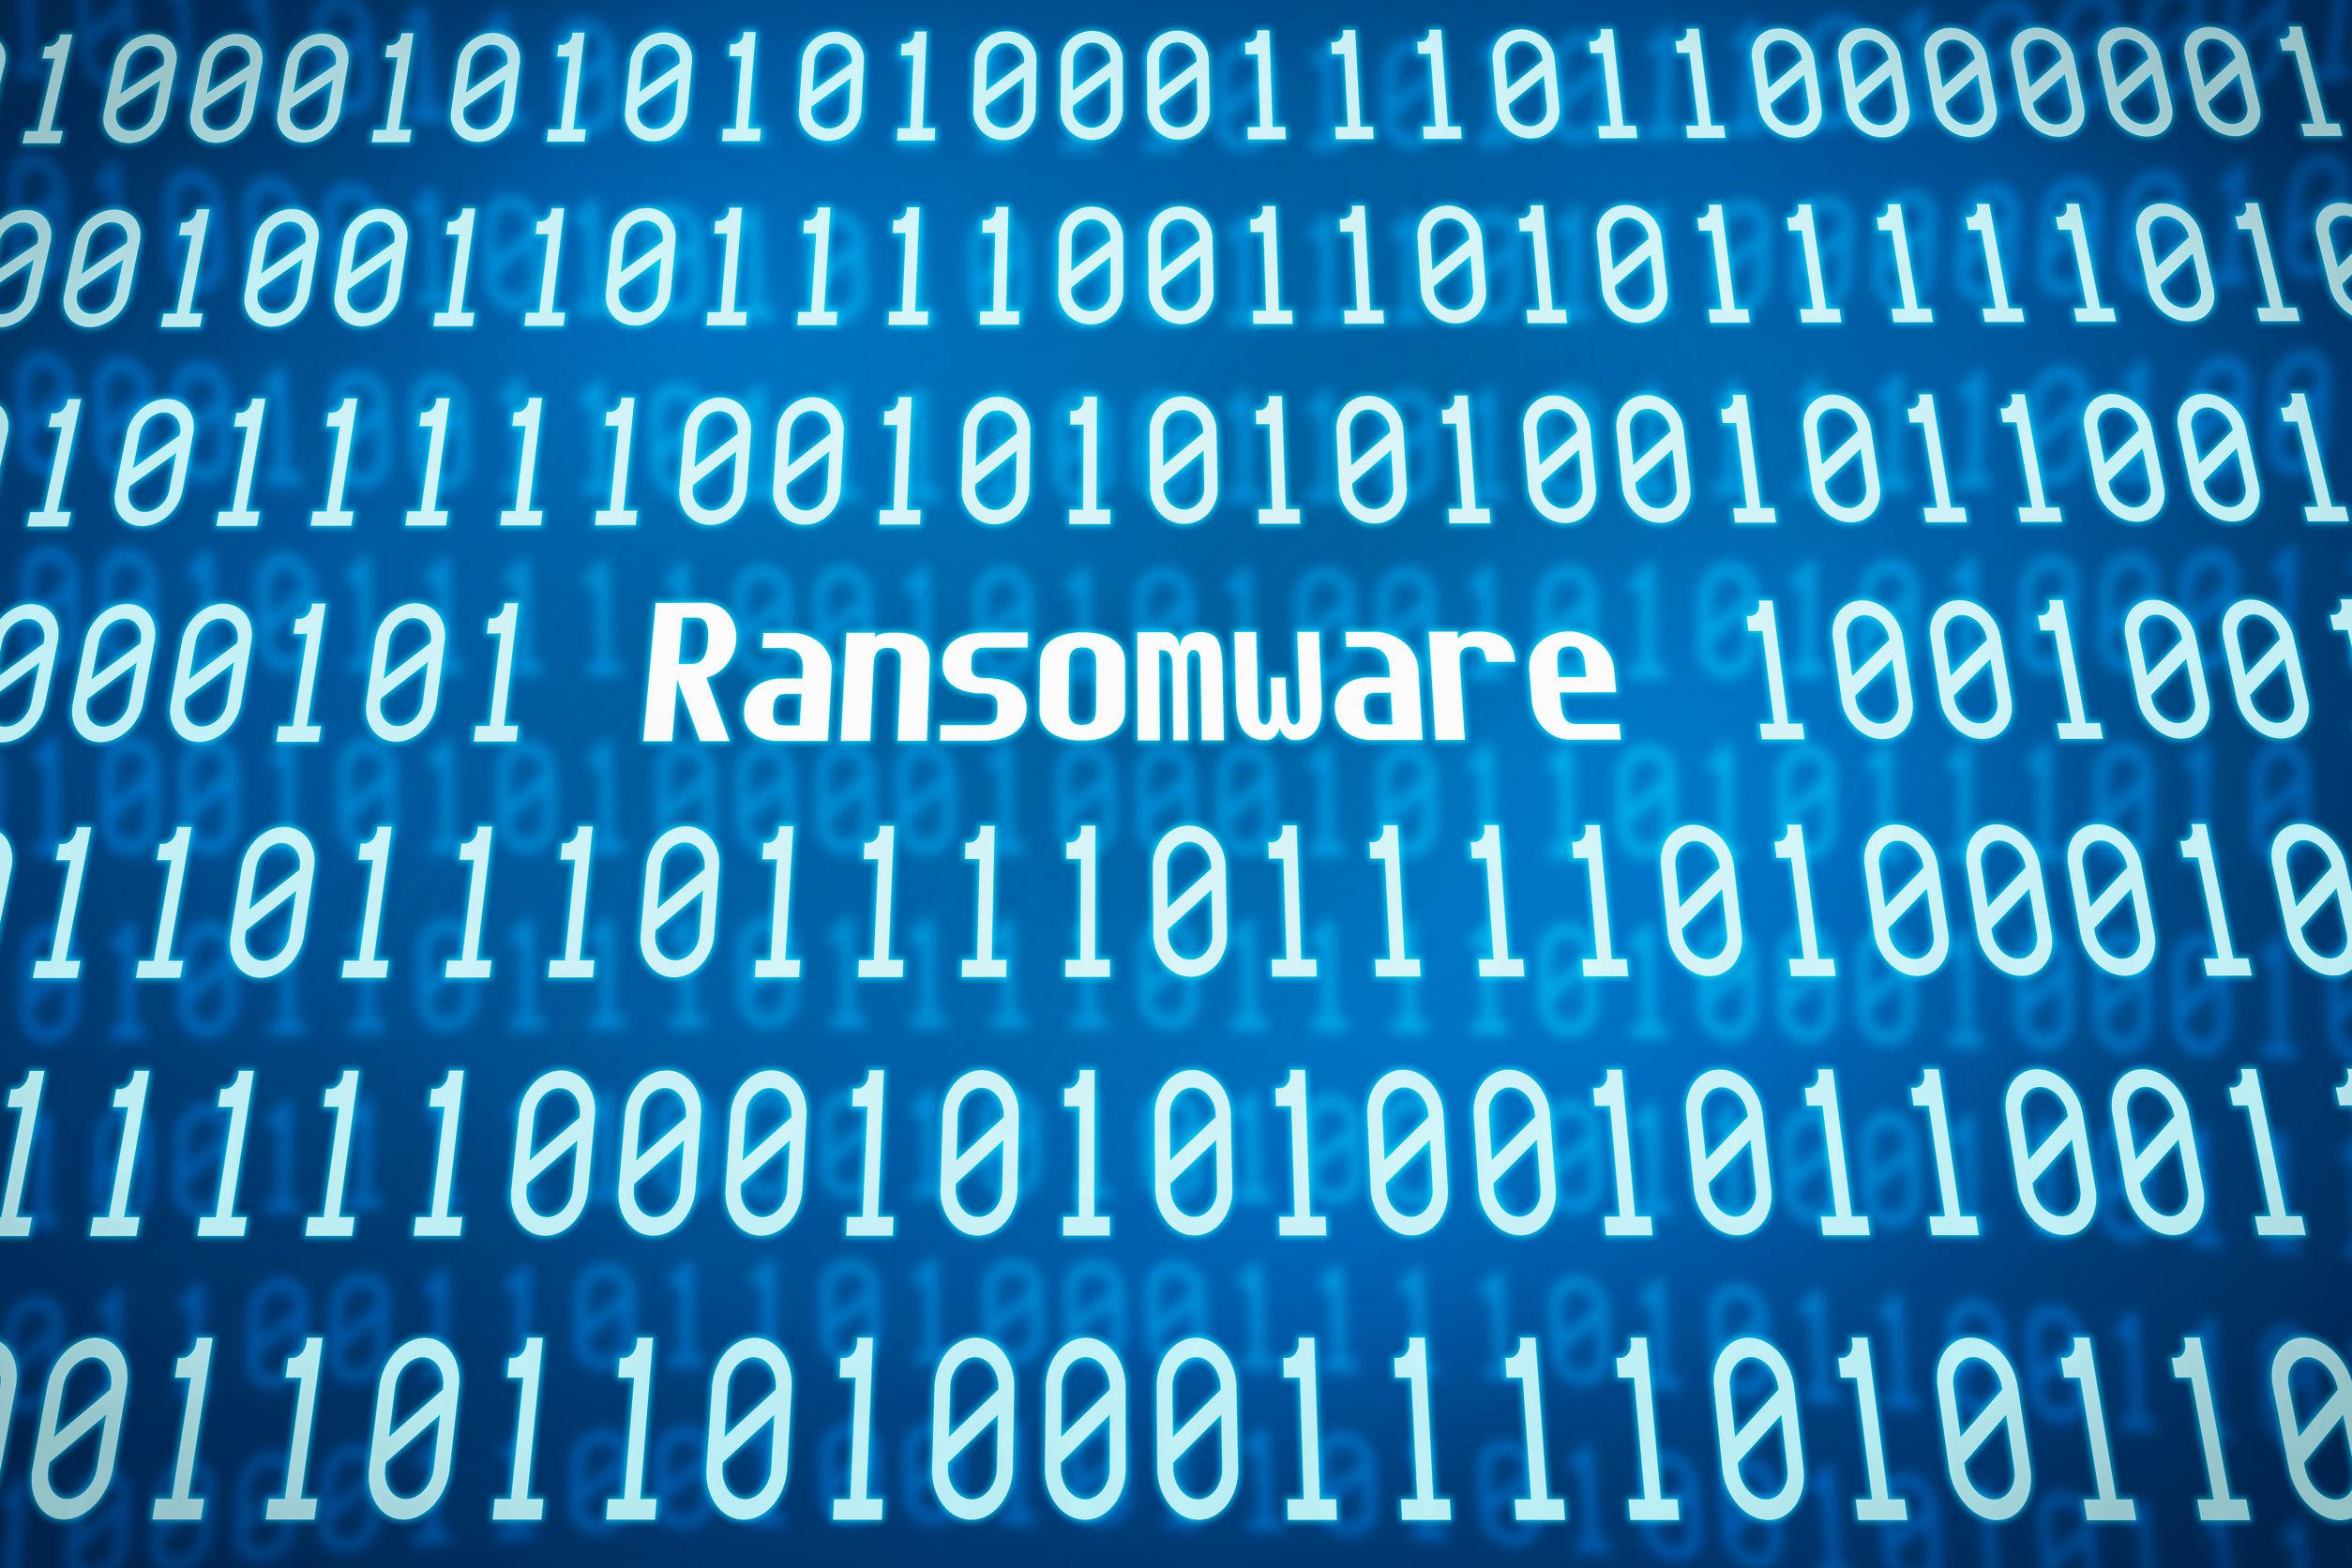 Ransomware binary code